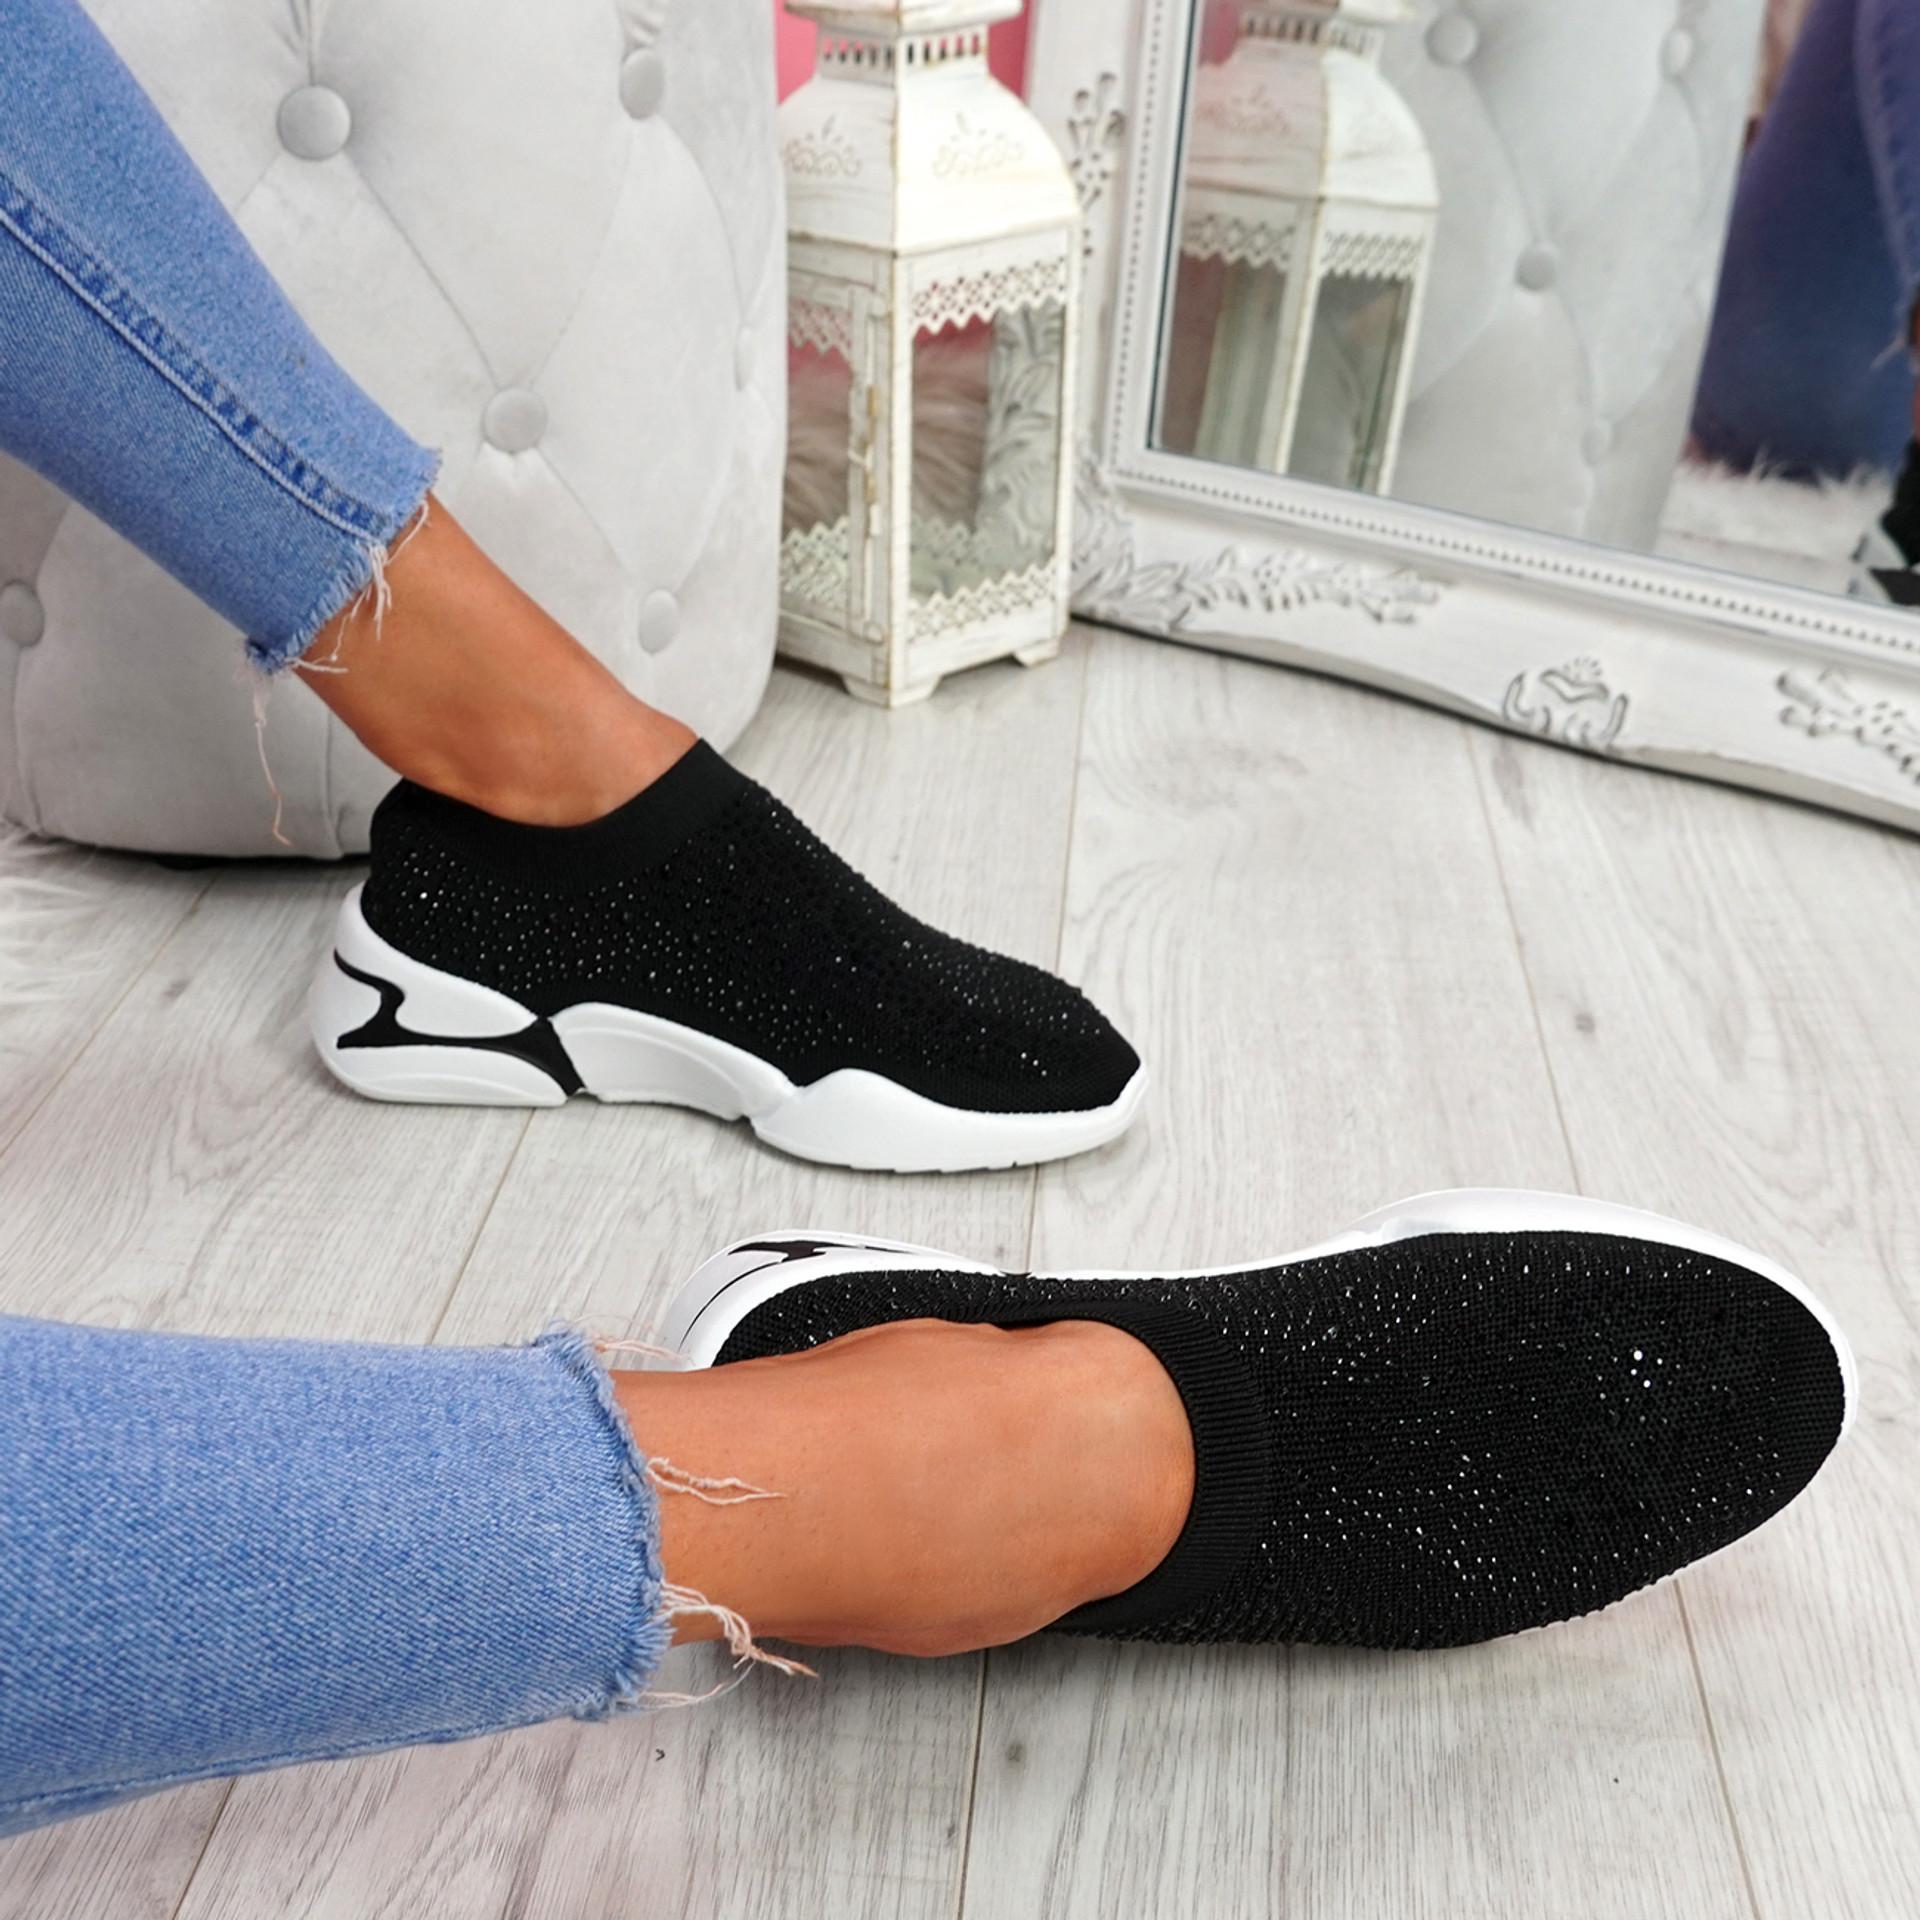 Eky Black Studded Knit Trainers